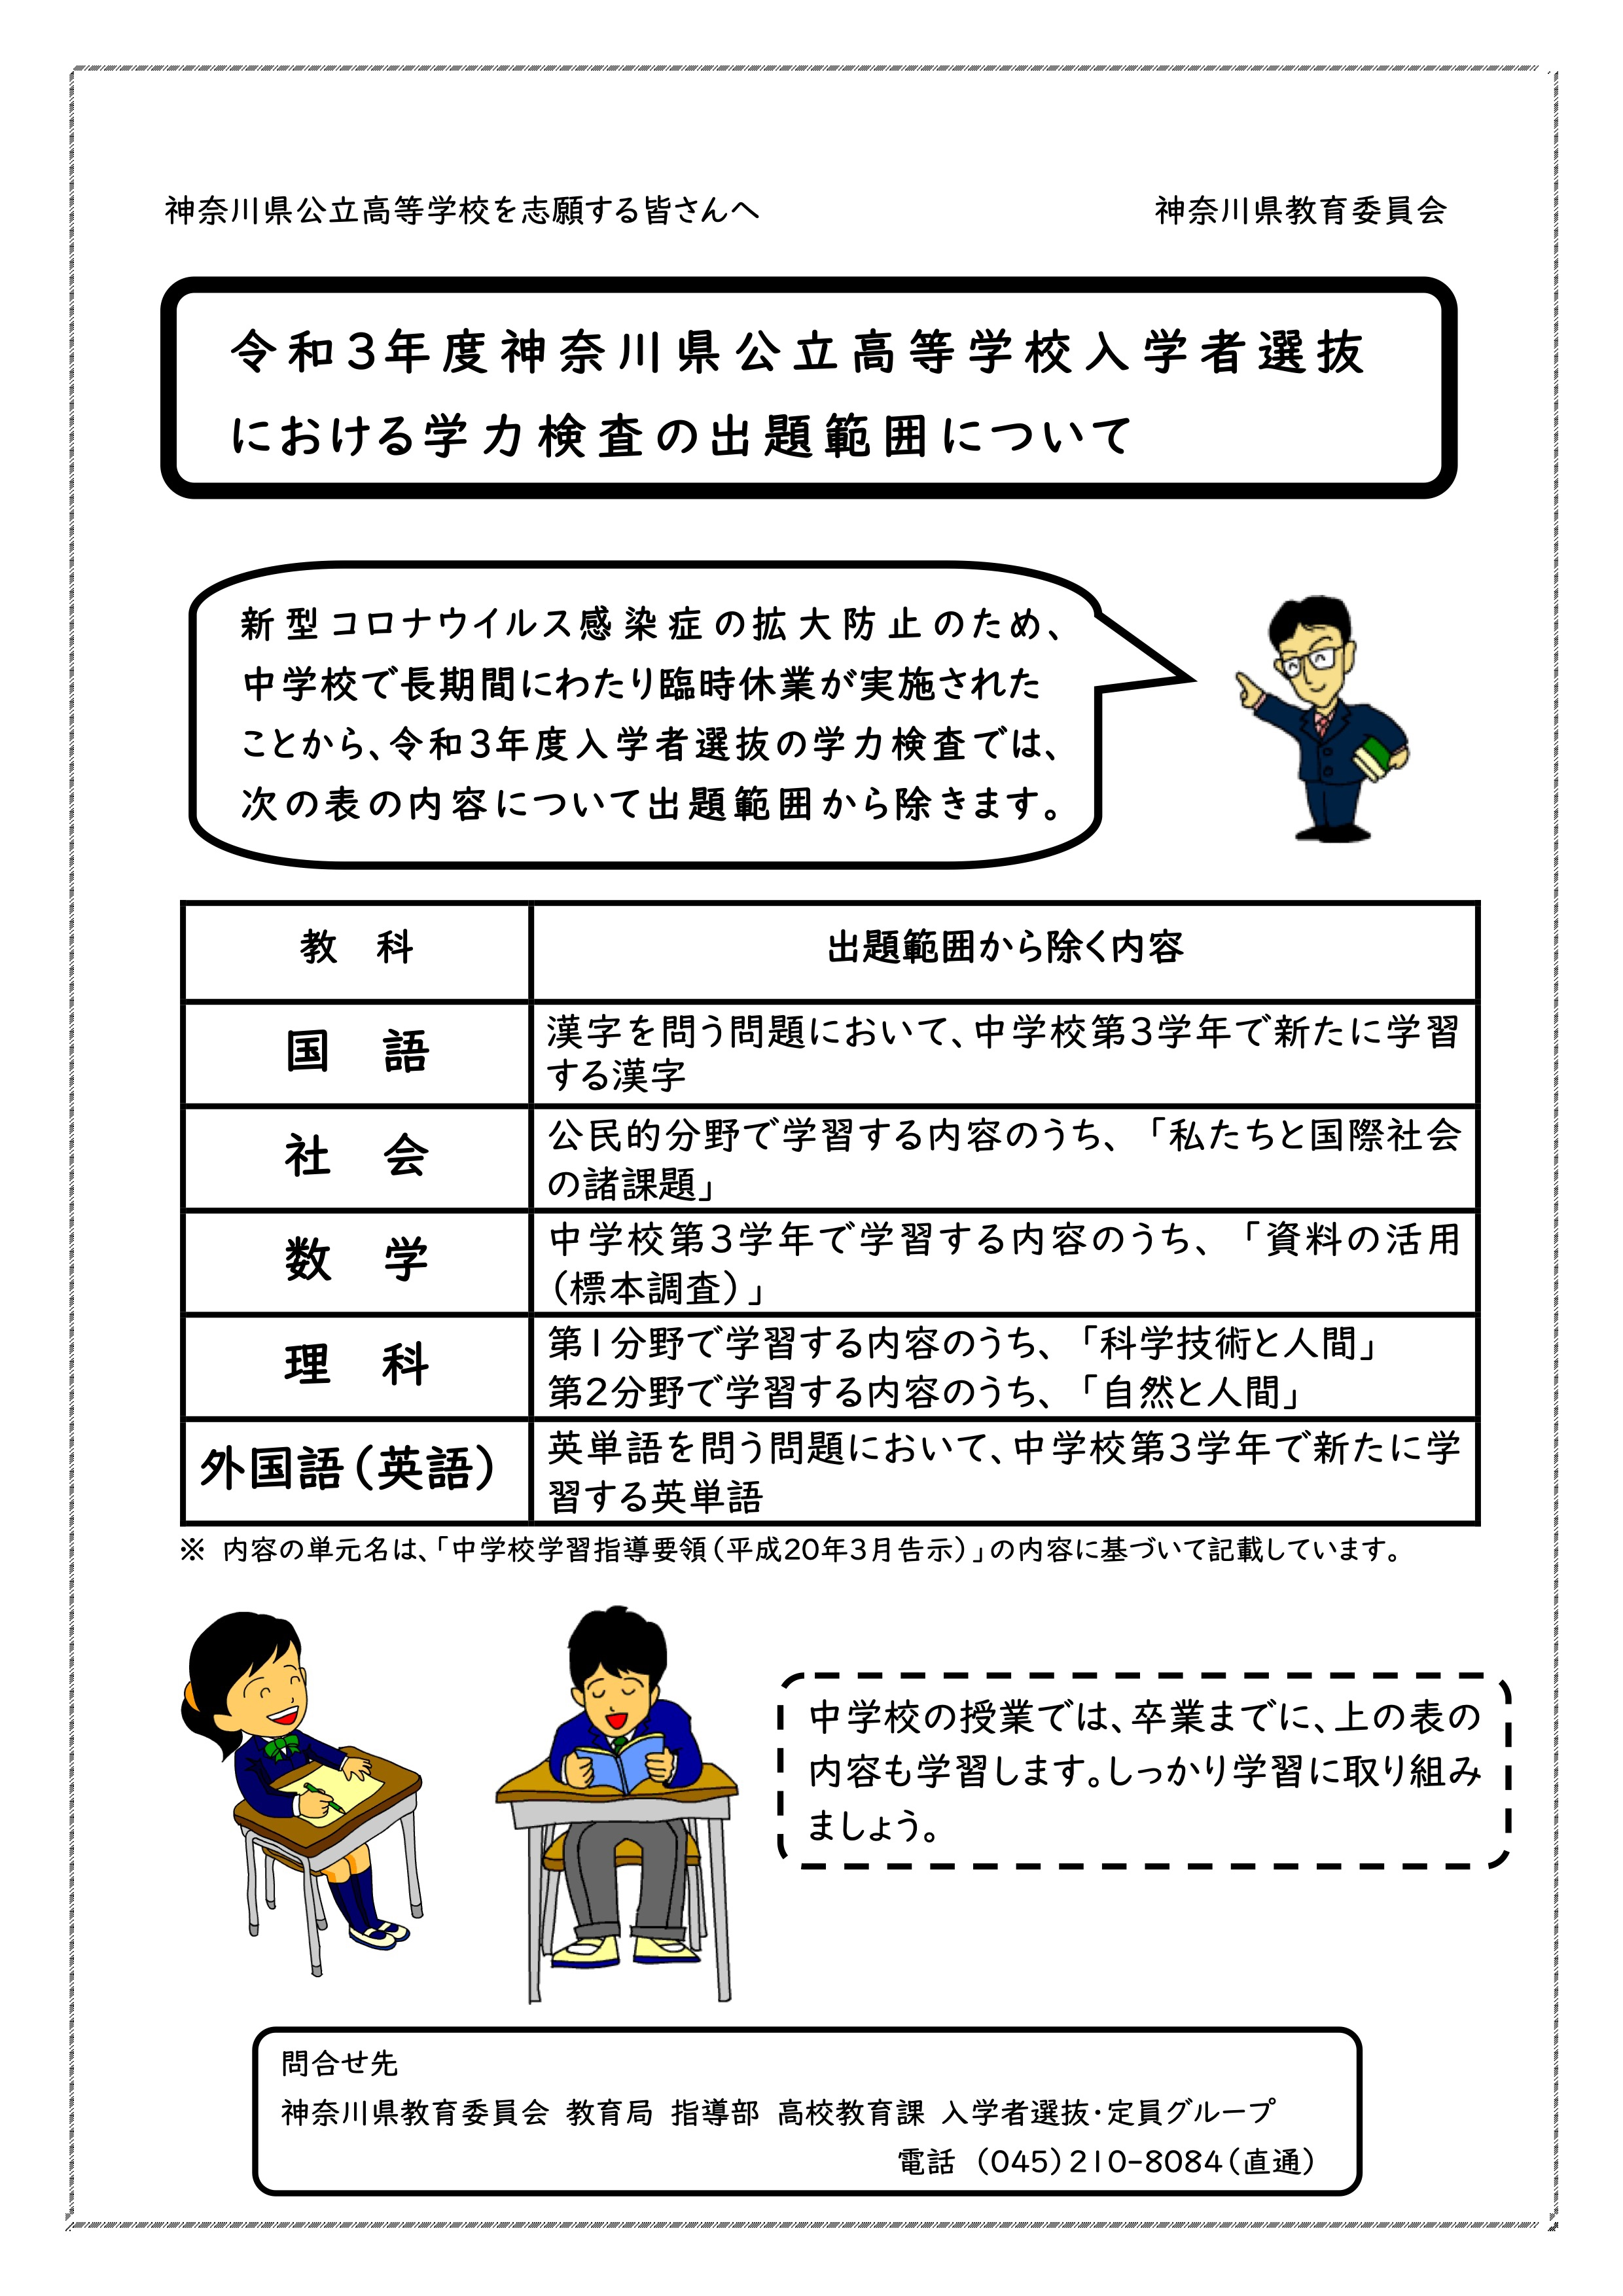 高校 神奈川 入試 県 神奈川県公立高校入試2021解答速報|難易度や平均点、合格ラインは?